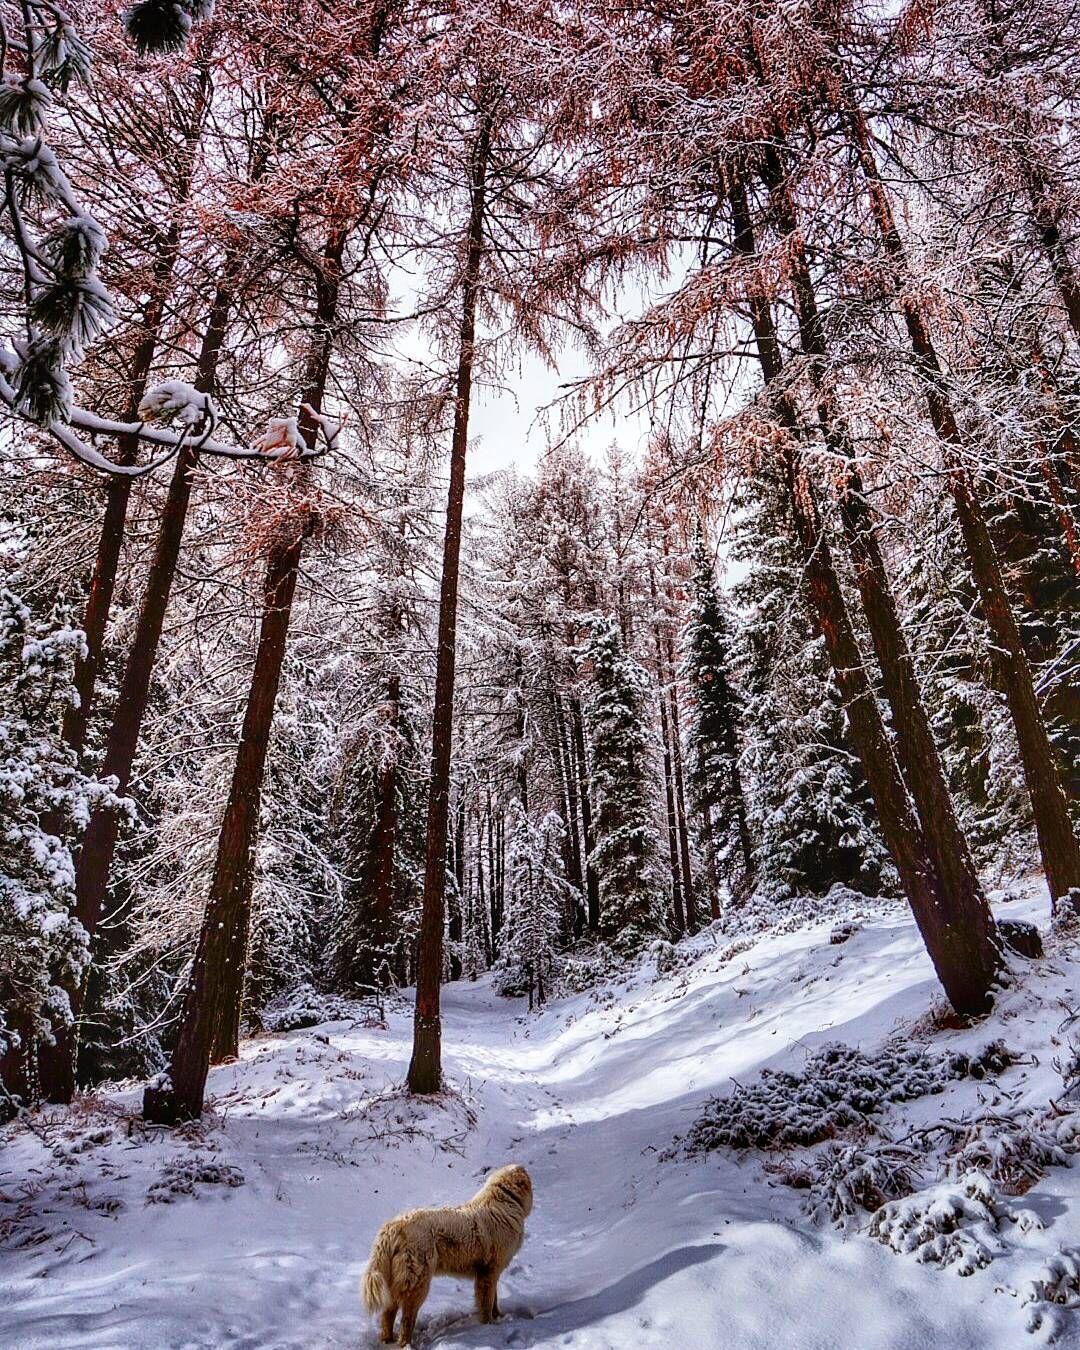 #winter #wintercolors #altoadige #südtirol #valgardena #outdoors by valenteana__